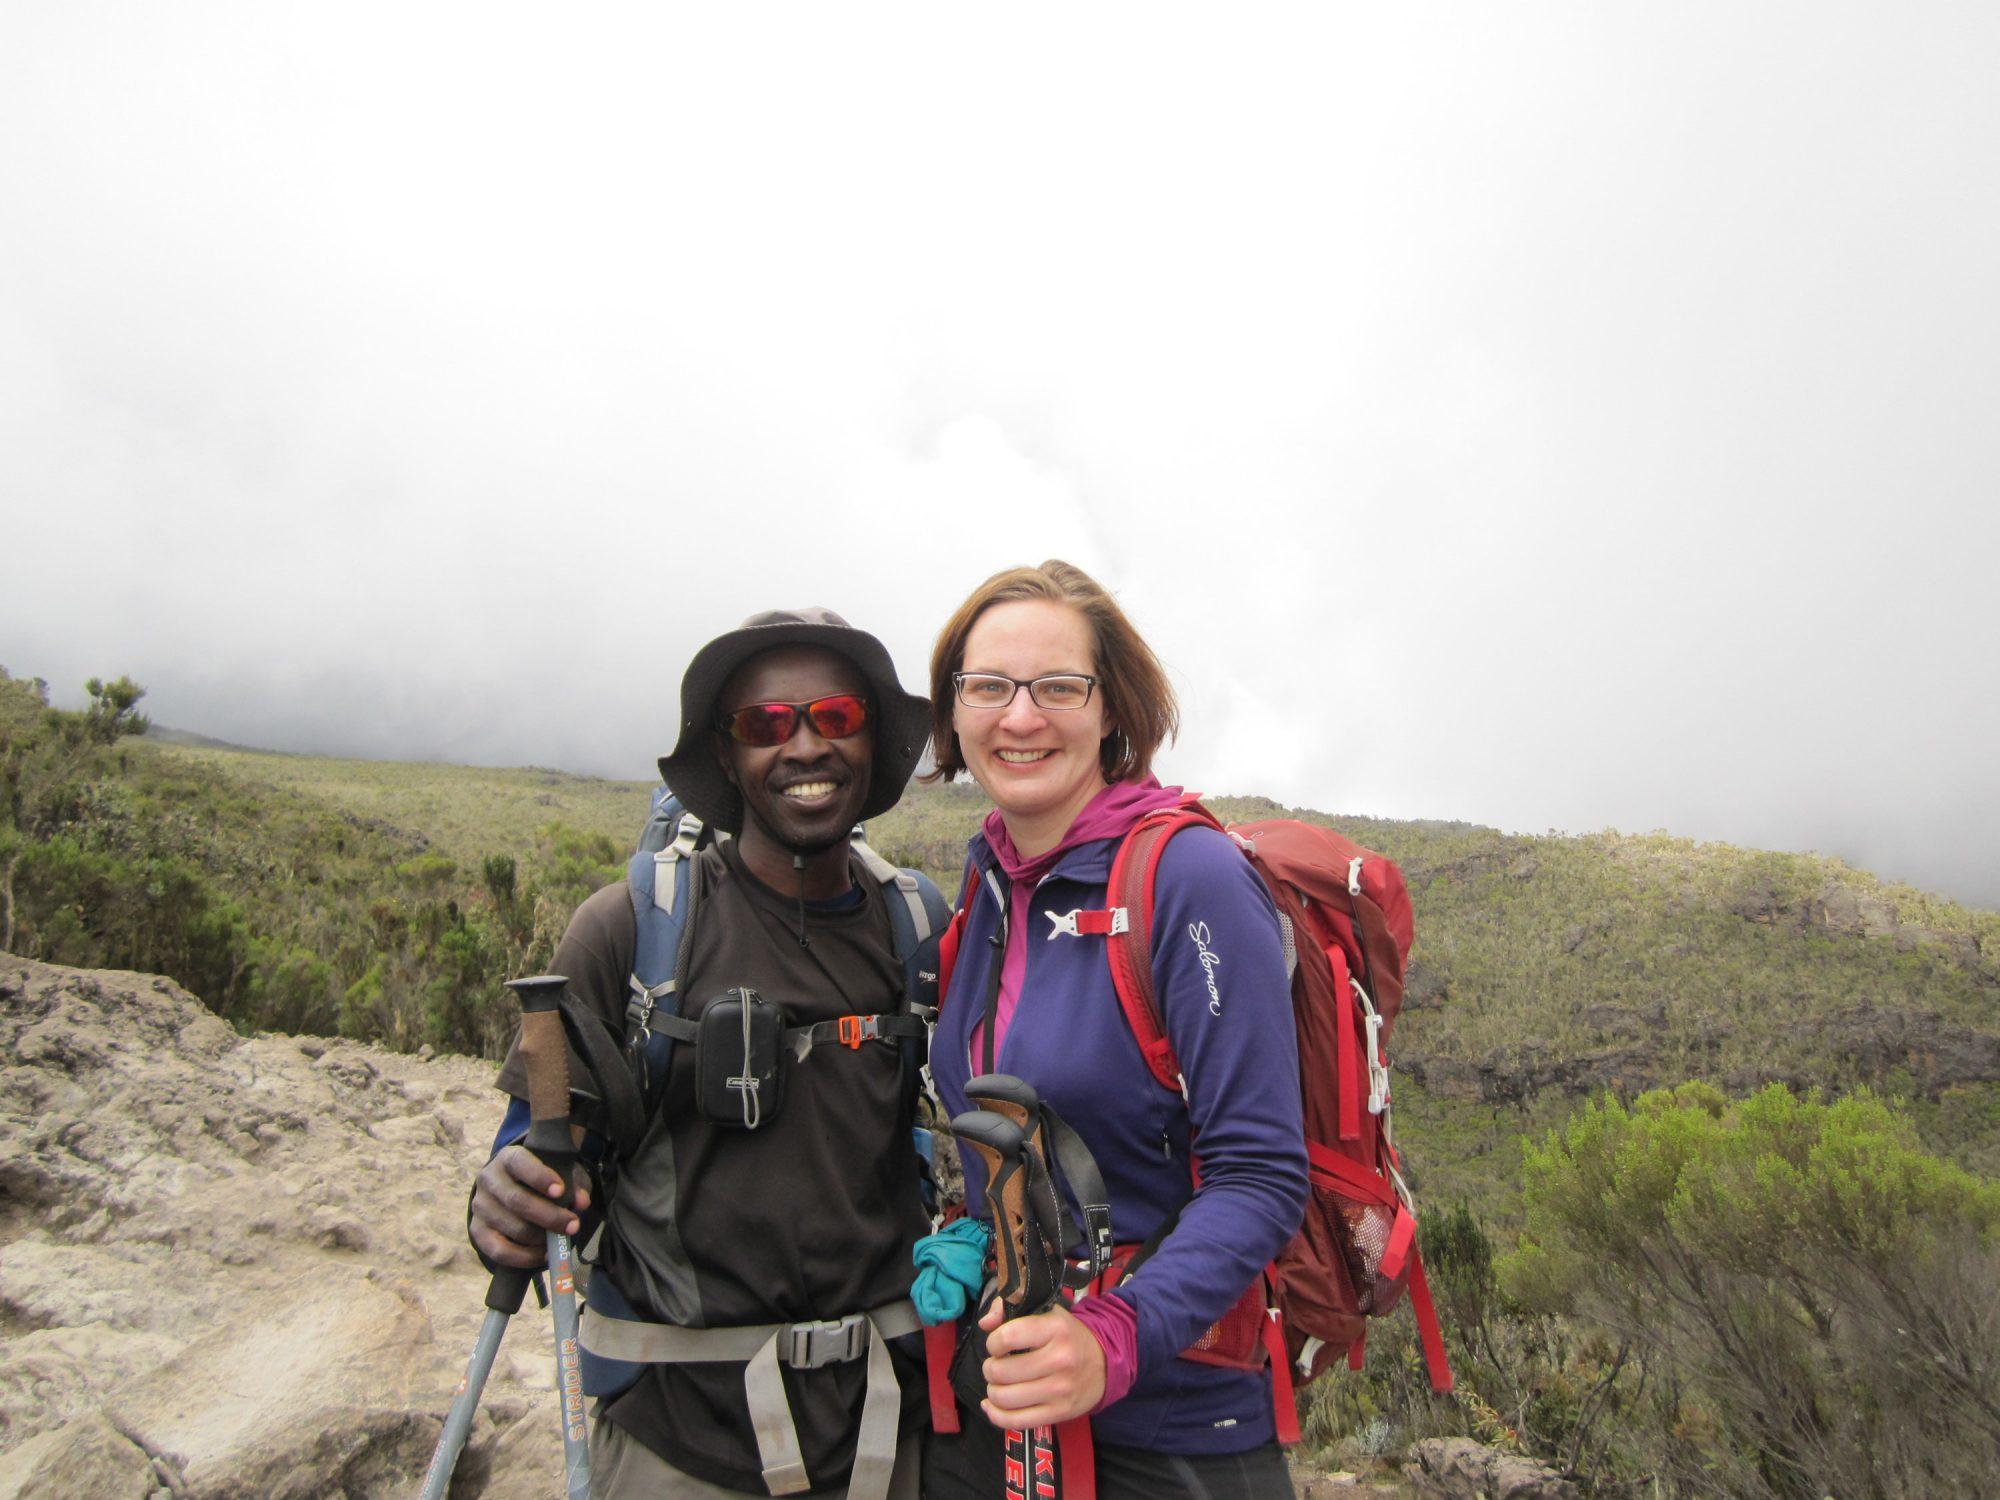 Müde Wanderer, Kilimandscharo, Kilimandscharo besteigen, Tansania, Afrika, Kilimandscharo Tour, Erfahrungsbericht, Machame Route